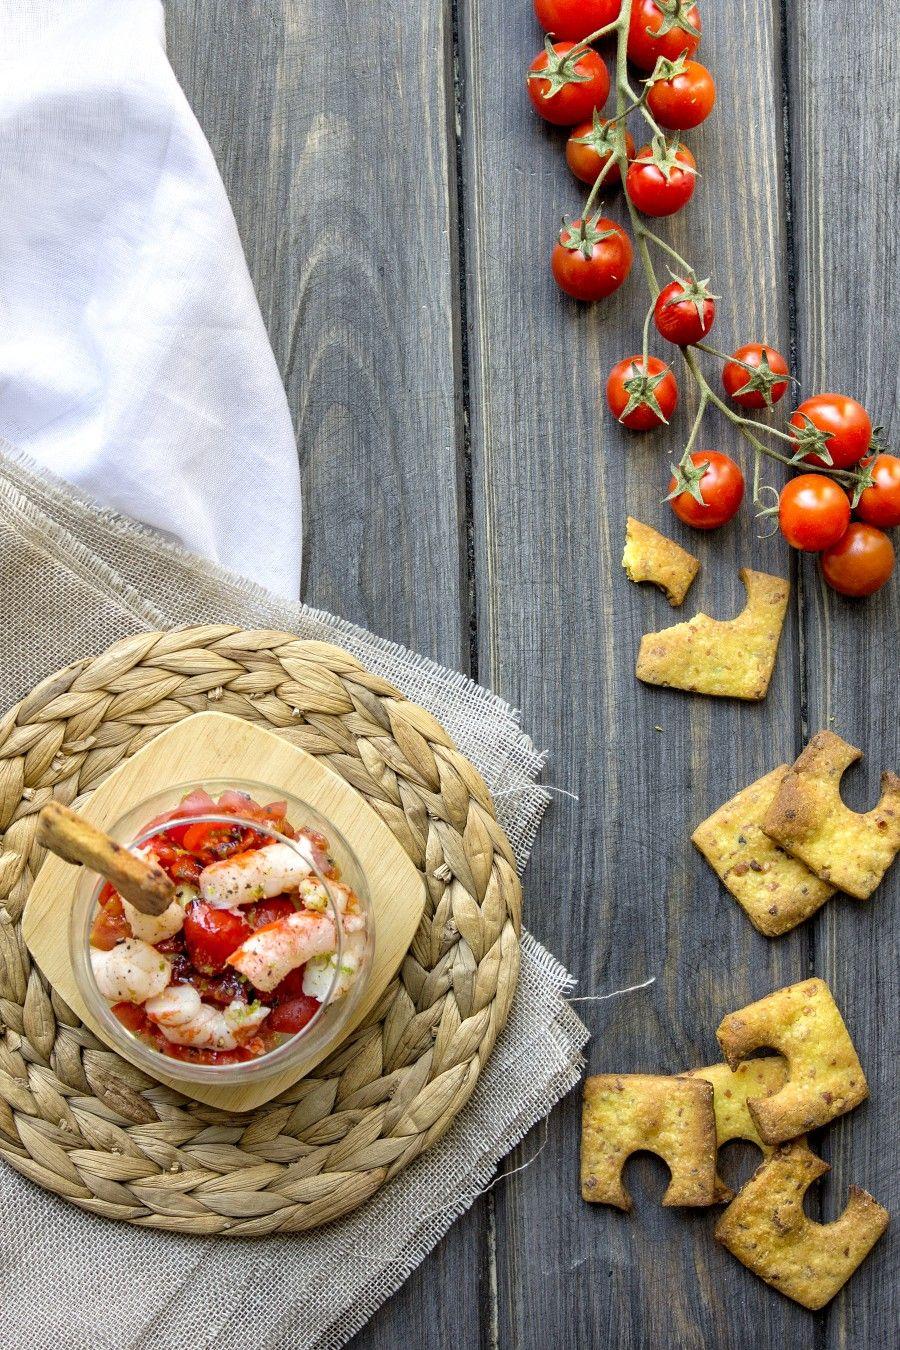 guacamole-con-biscotto-frolla-salata-4-contemporaneo-food